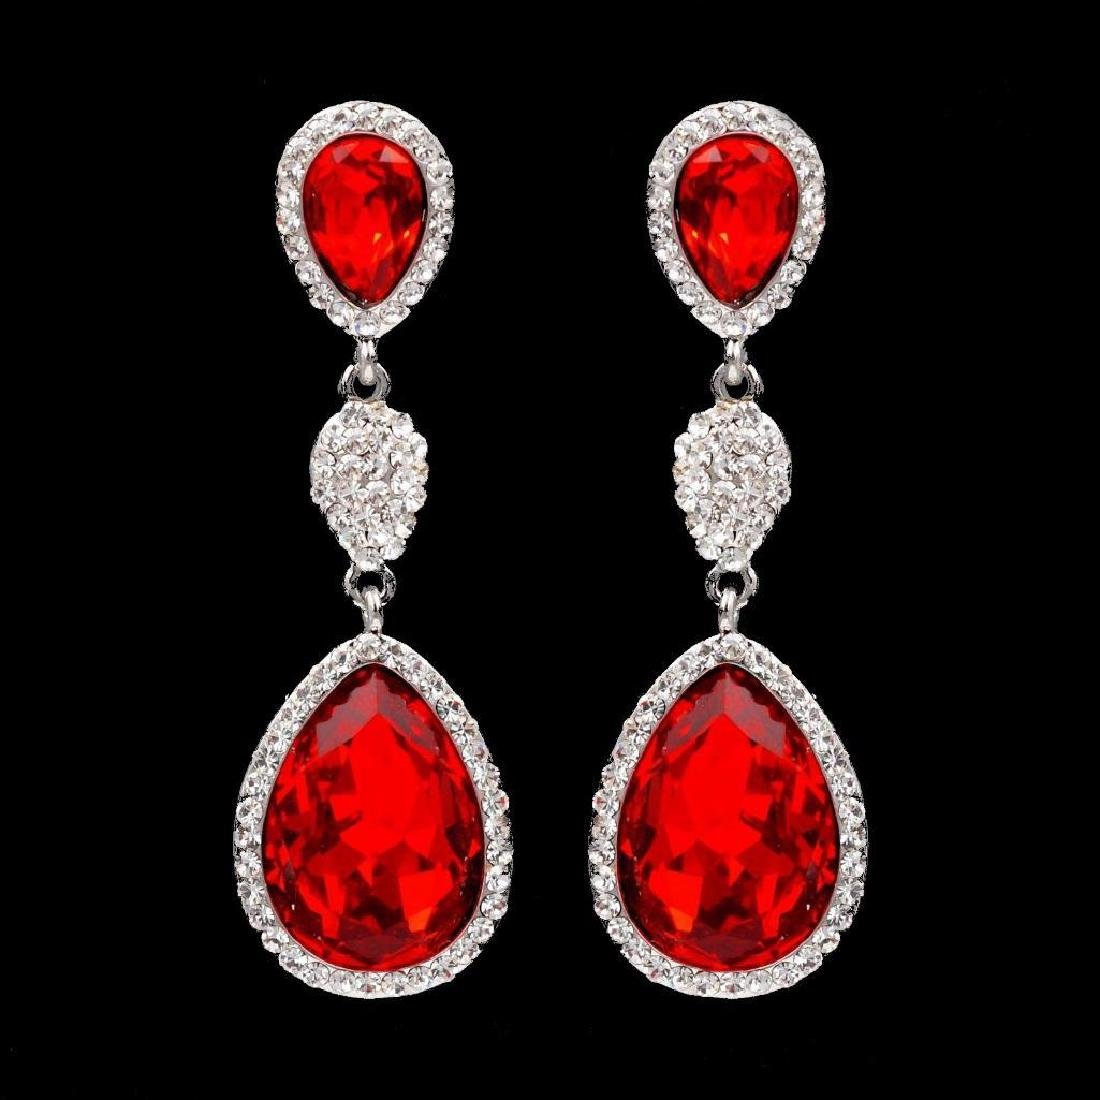 Rhodium Plated Red Crystal Rhinestone Chandelier Drop